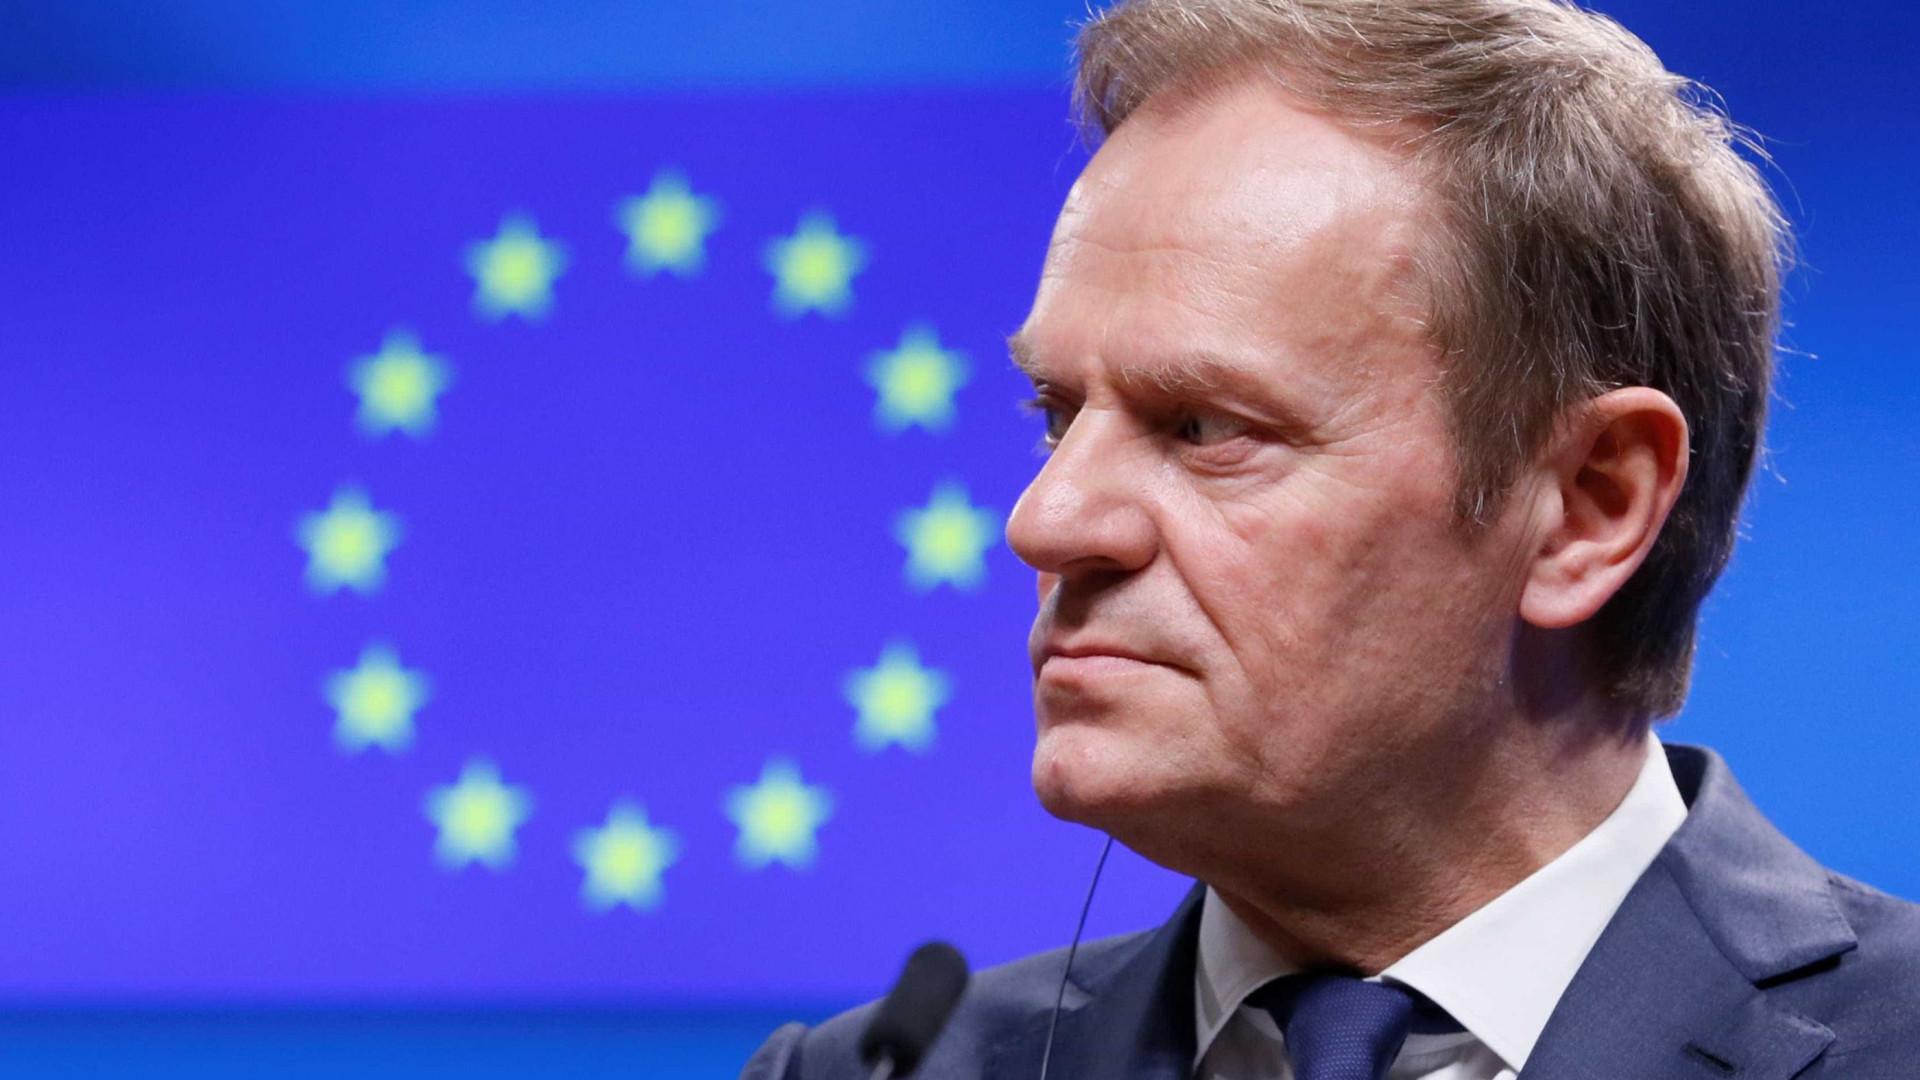 Tusk confirma que May aceitou as datas propostas pela UE